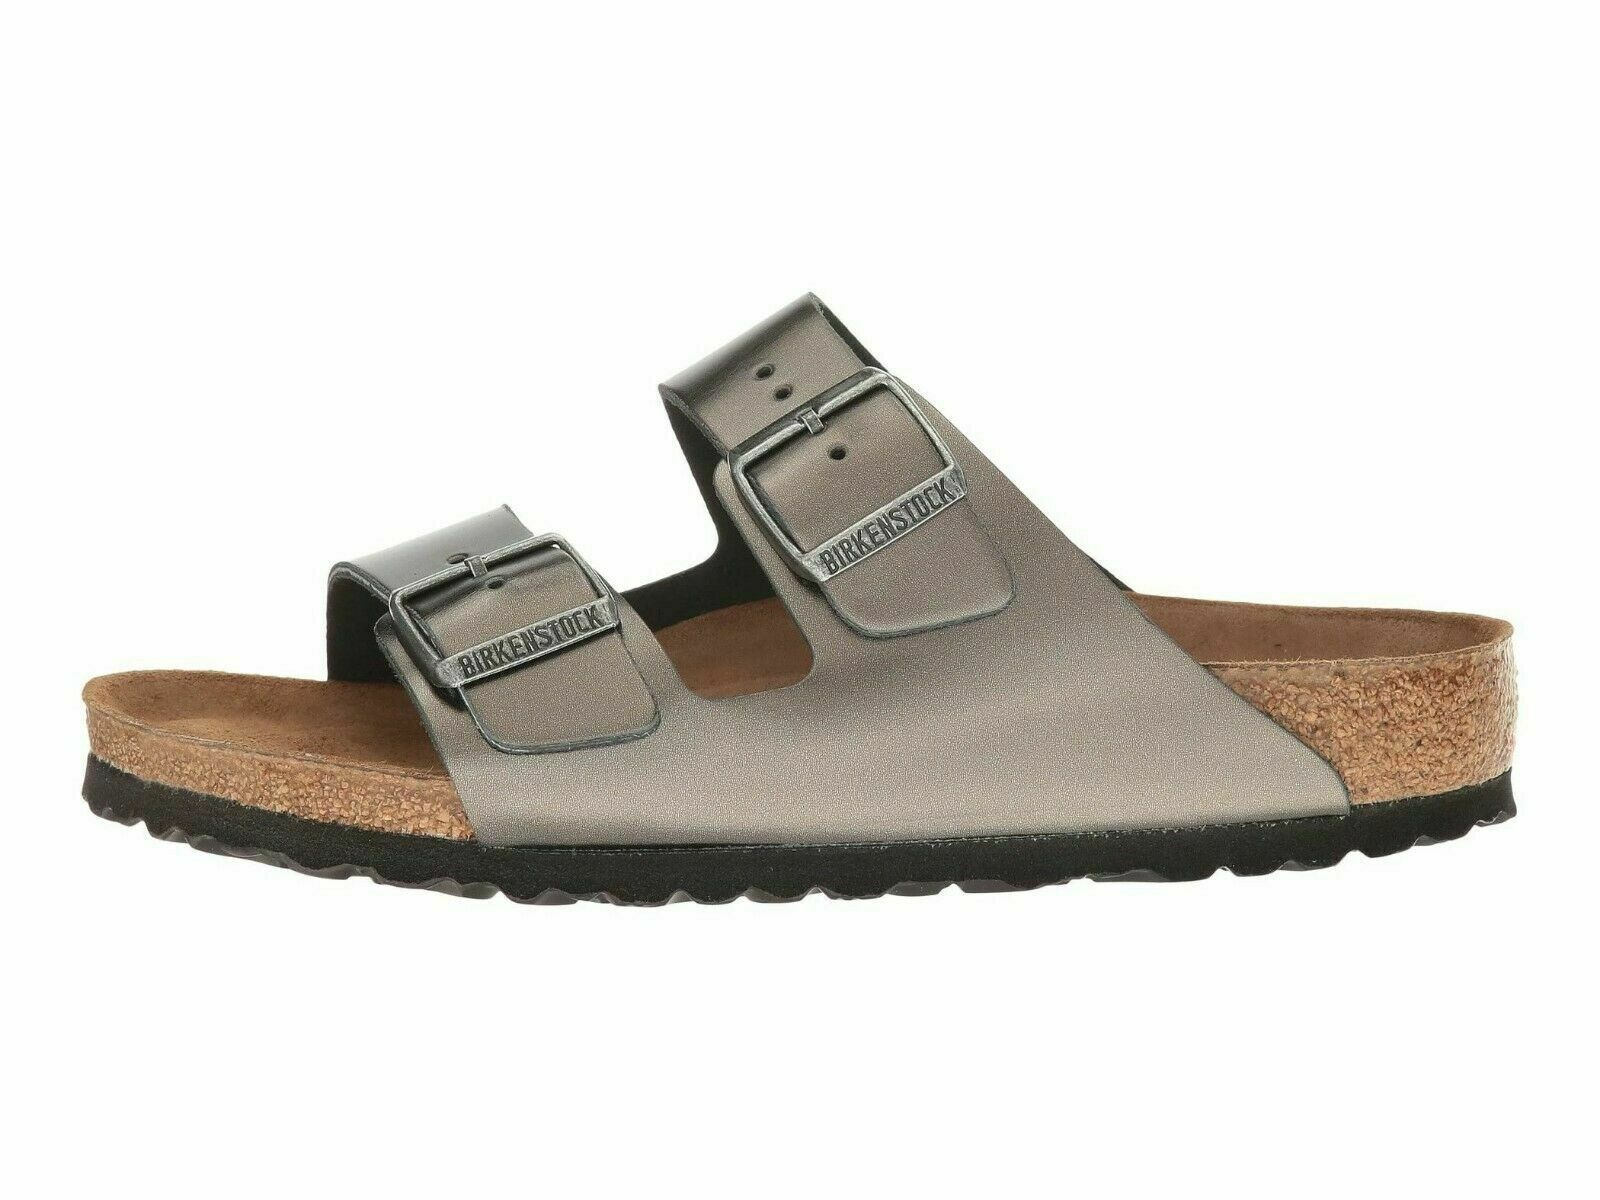 Birkenstock Arizona Soft Footbed Anthracite Women's Sandals 1000295 - $119.00